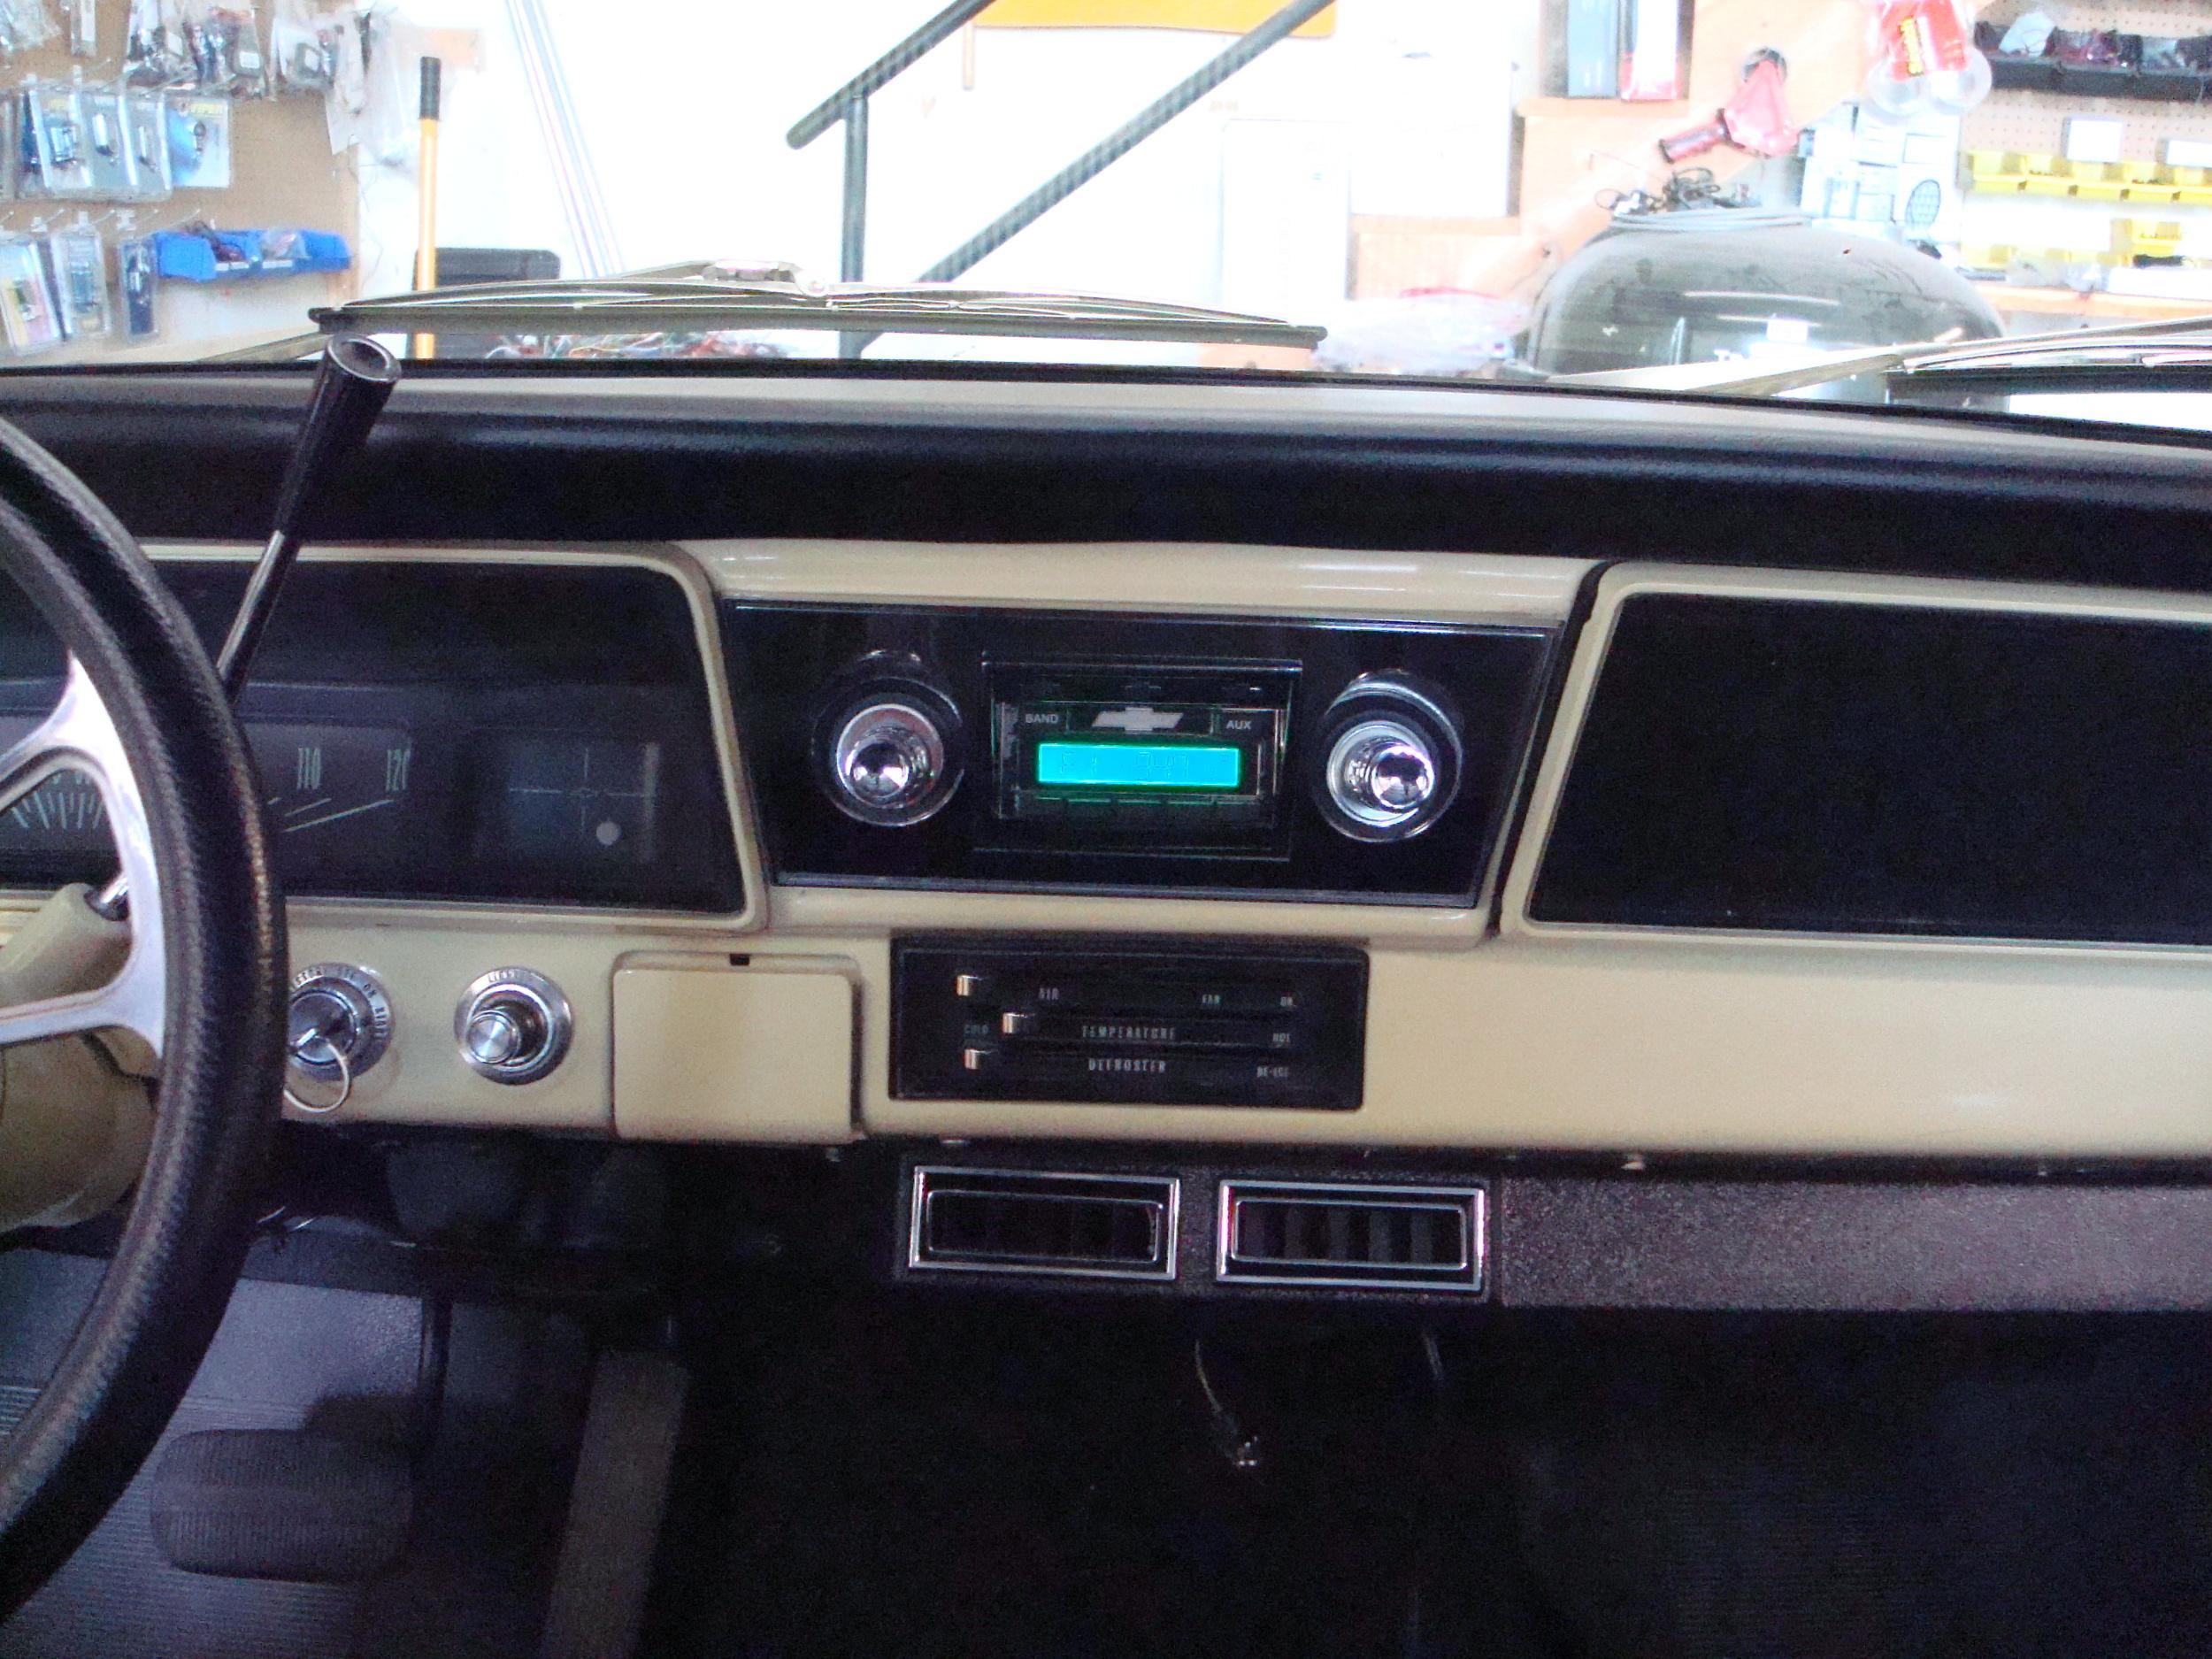 1967 Chevy II Wagon - Head Unit Installation, Factory Location